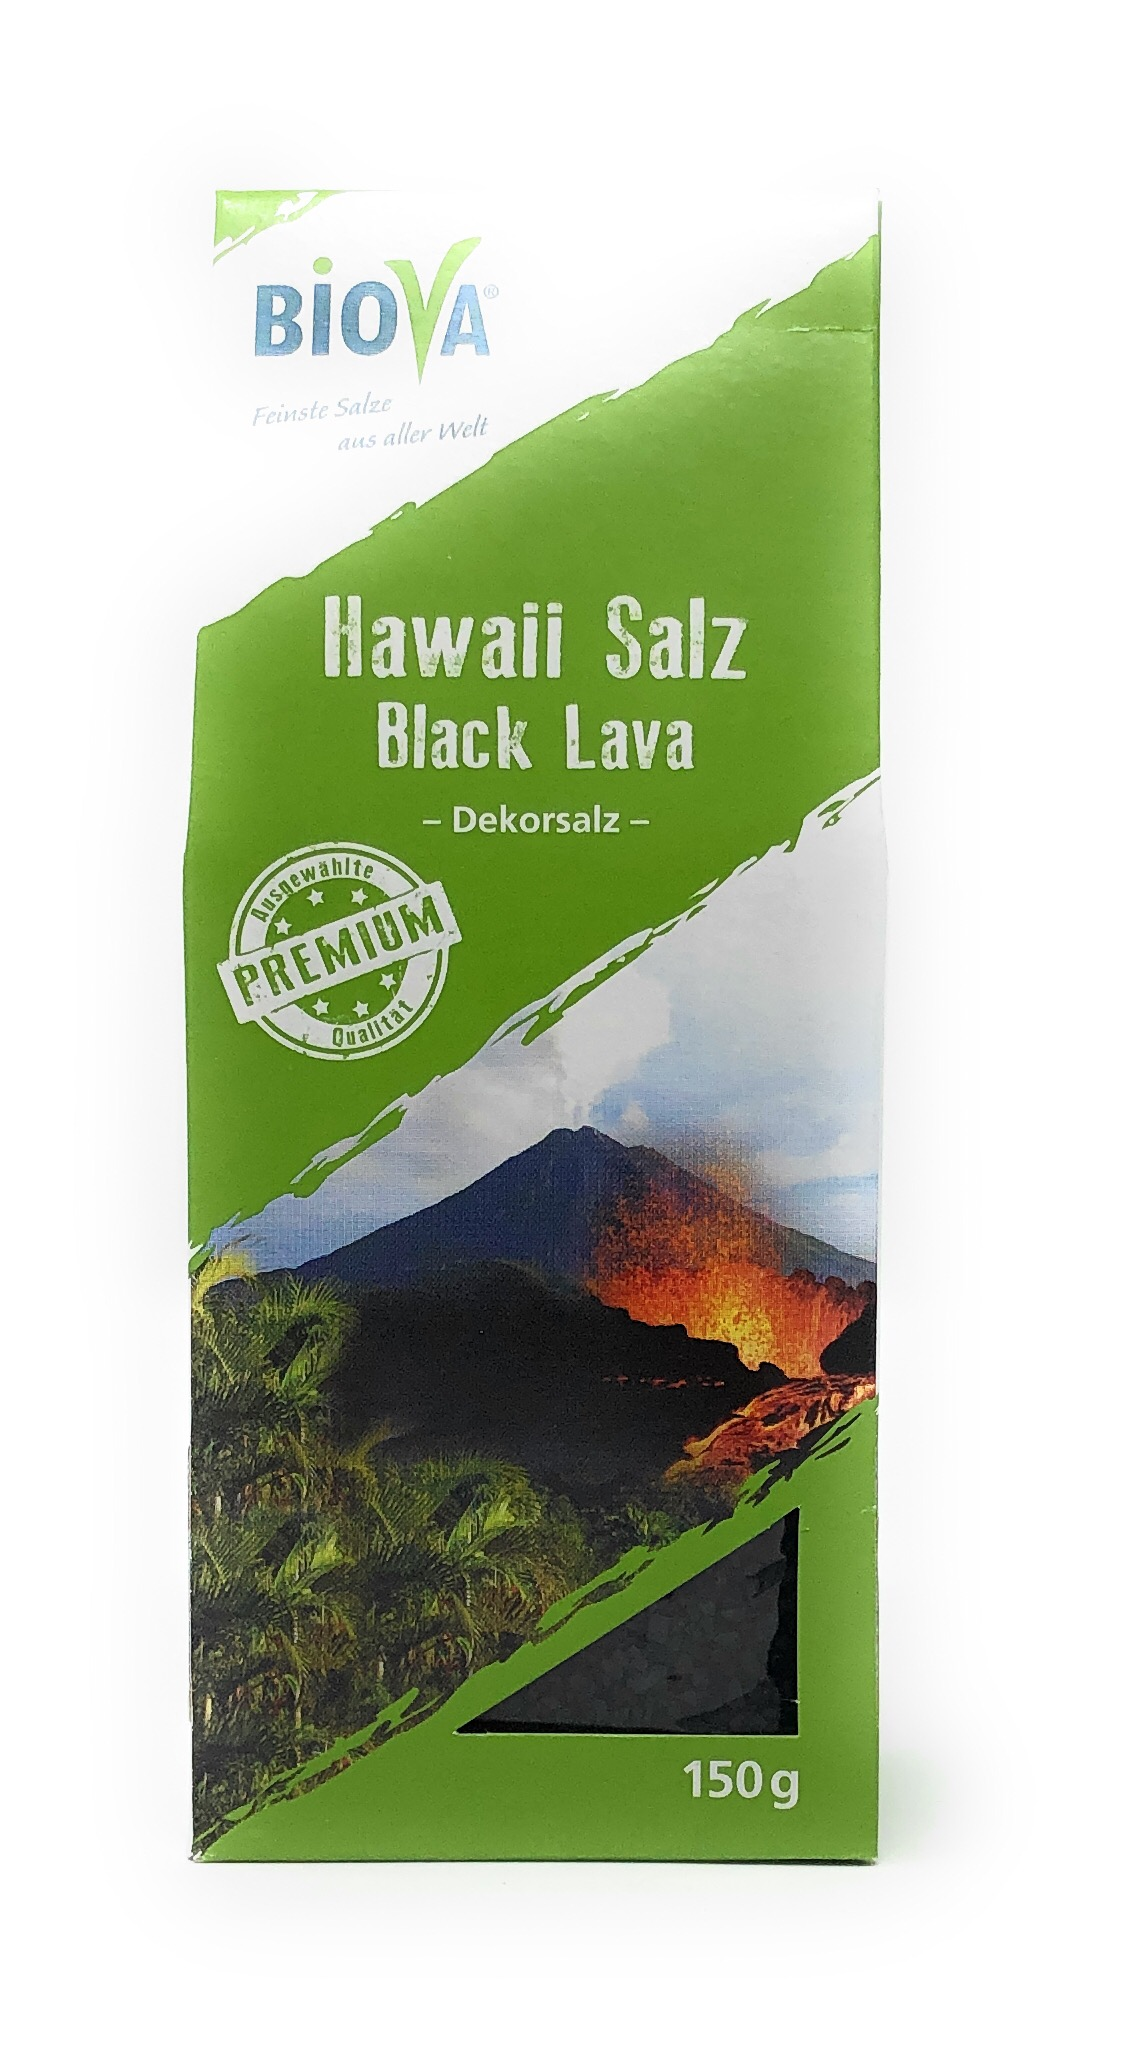 Biova Gourmetsalz Hawaii Salz schwarz* Black Lava 1-2mm 150g